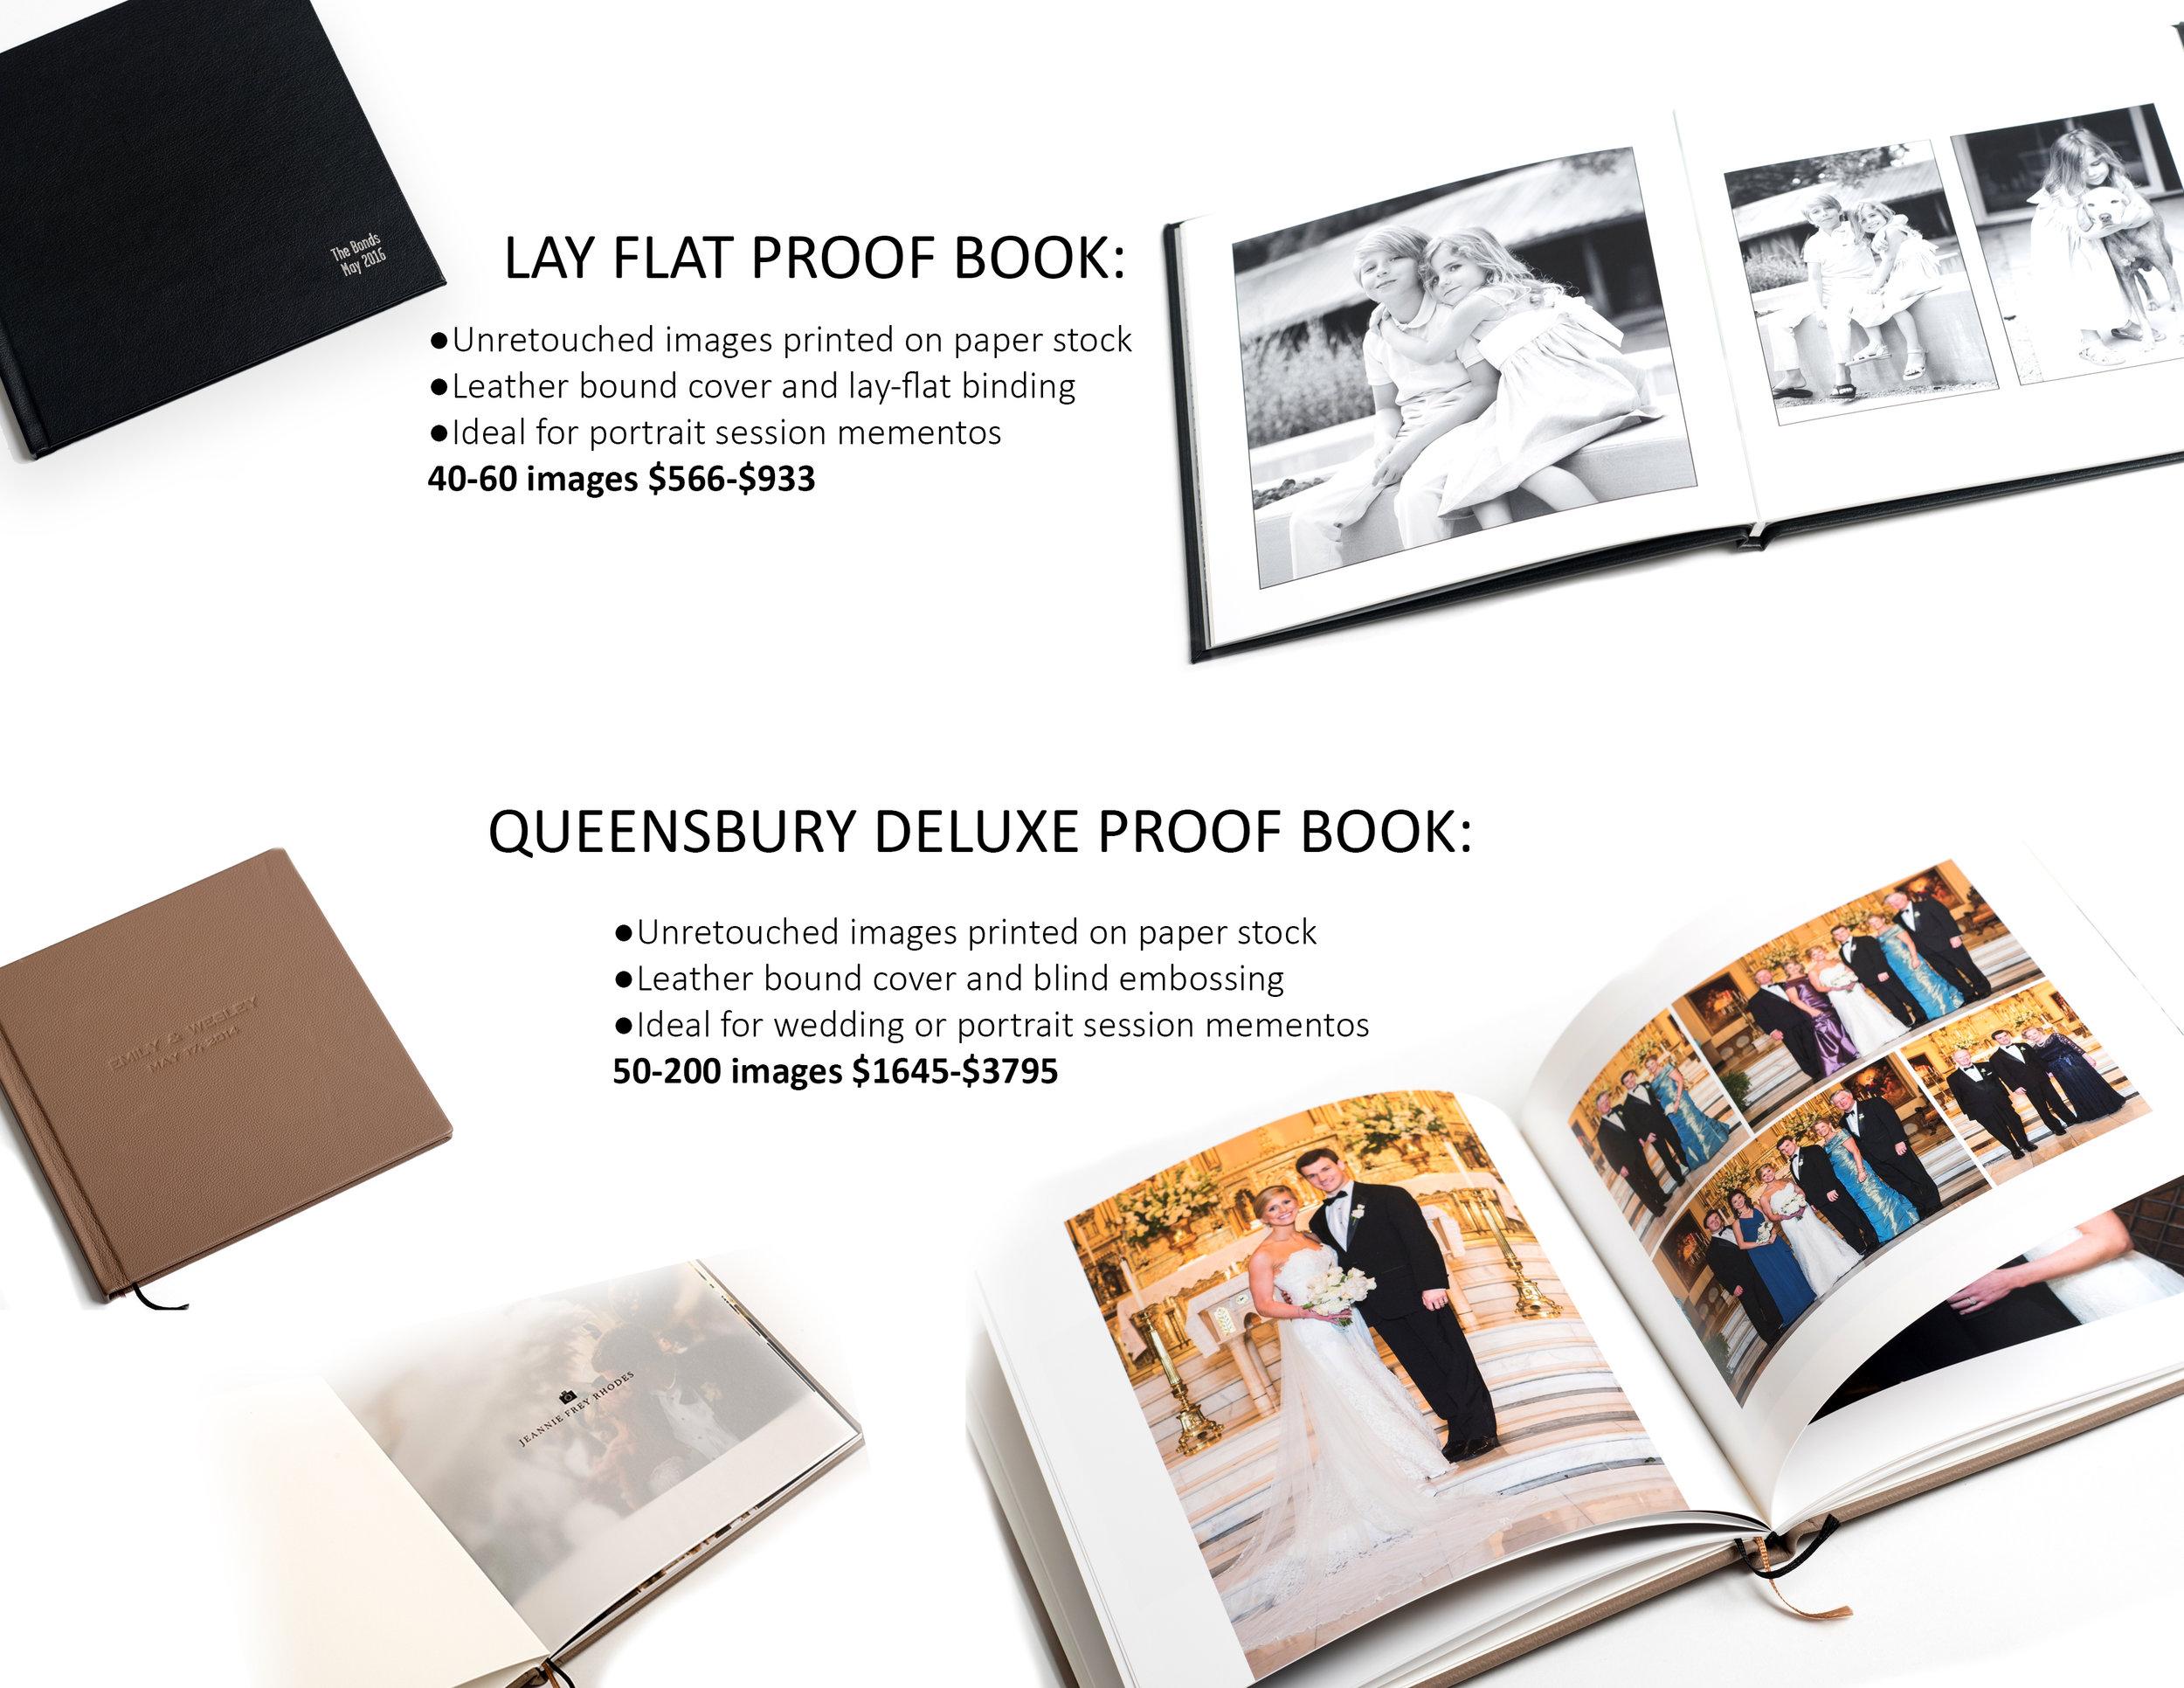 JFR PROOF BOOKS.jpg